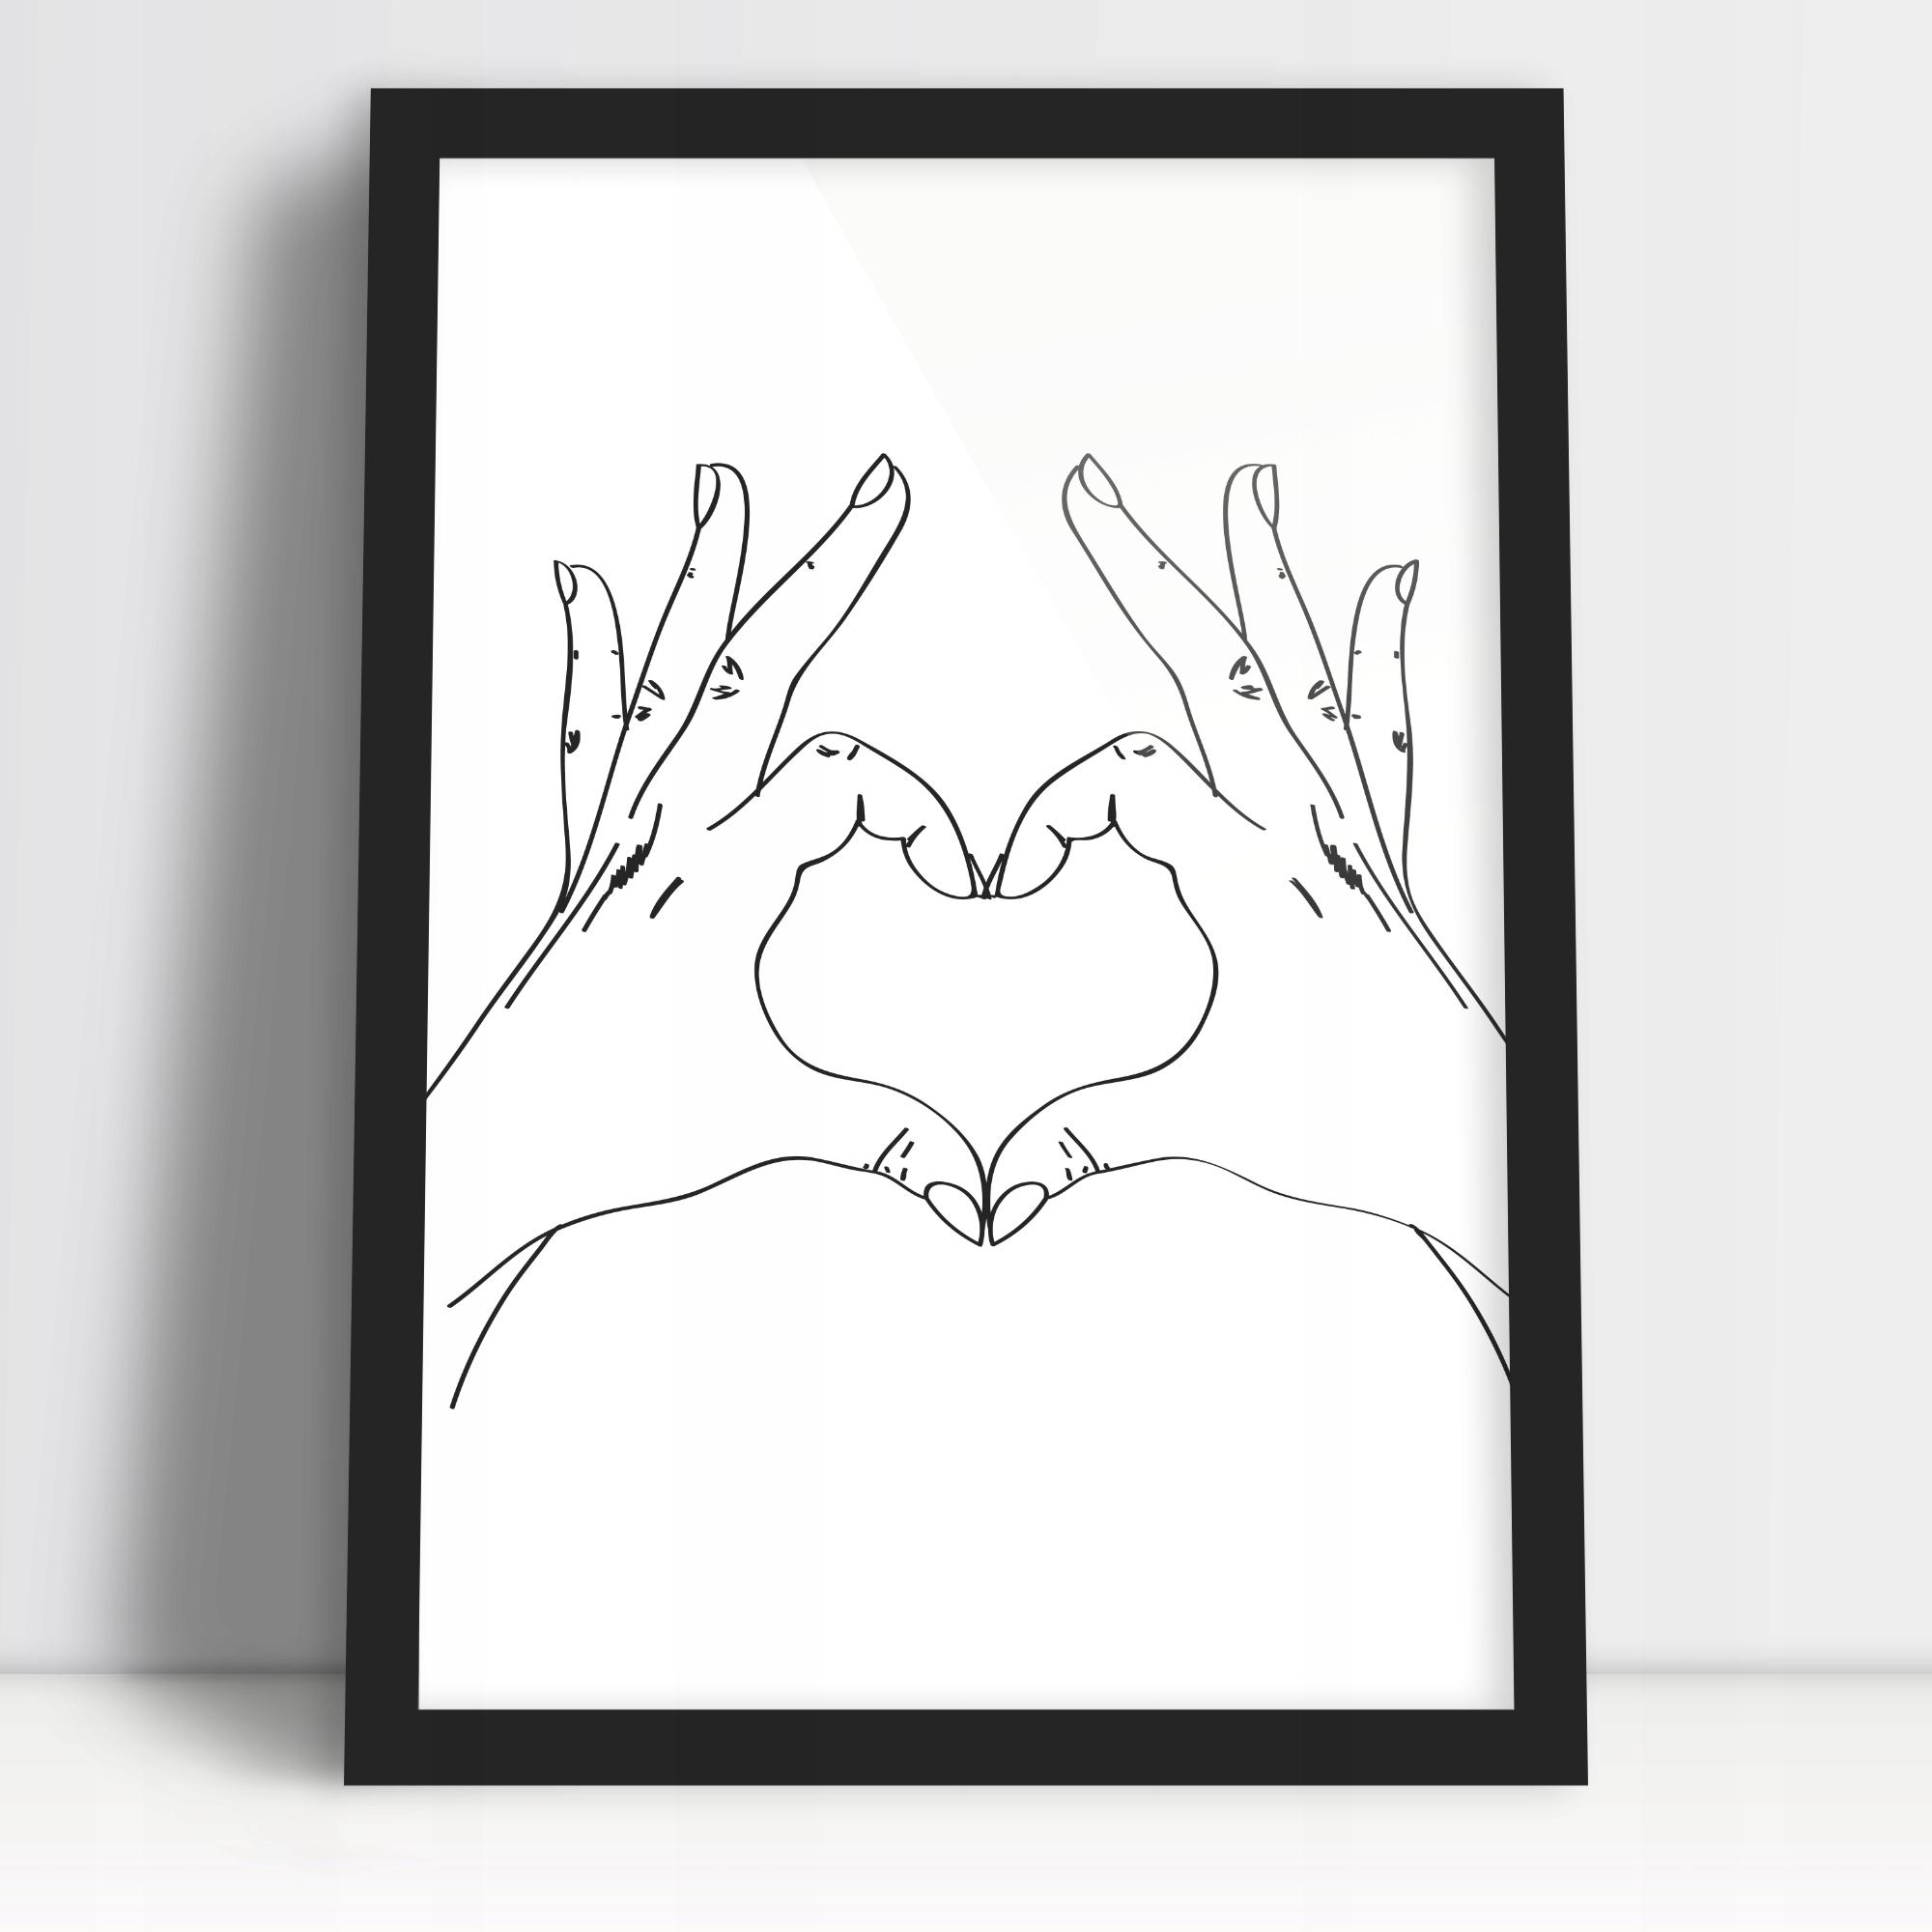 Плакат для любимого на День святого Валентина руки в рамке А3